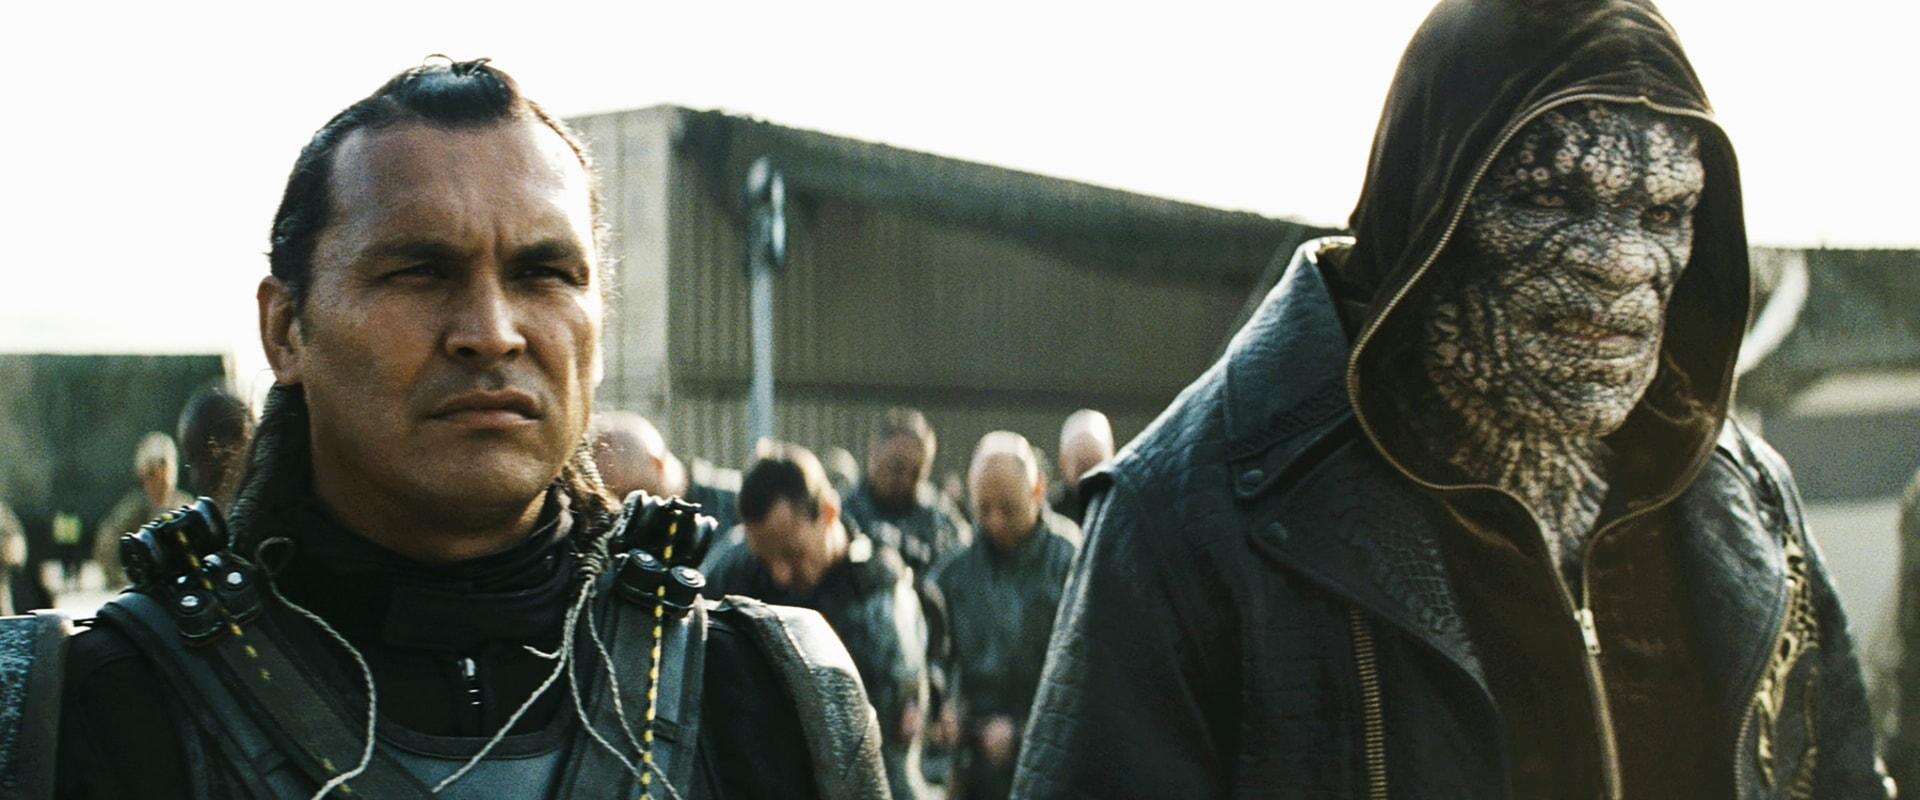 ADAM BEACH as Slipknot and ADEWALE AKINNUOYE-AGBAJE as Killer Croc